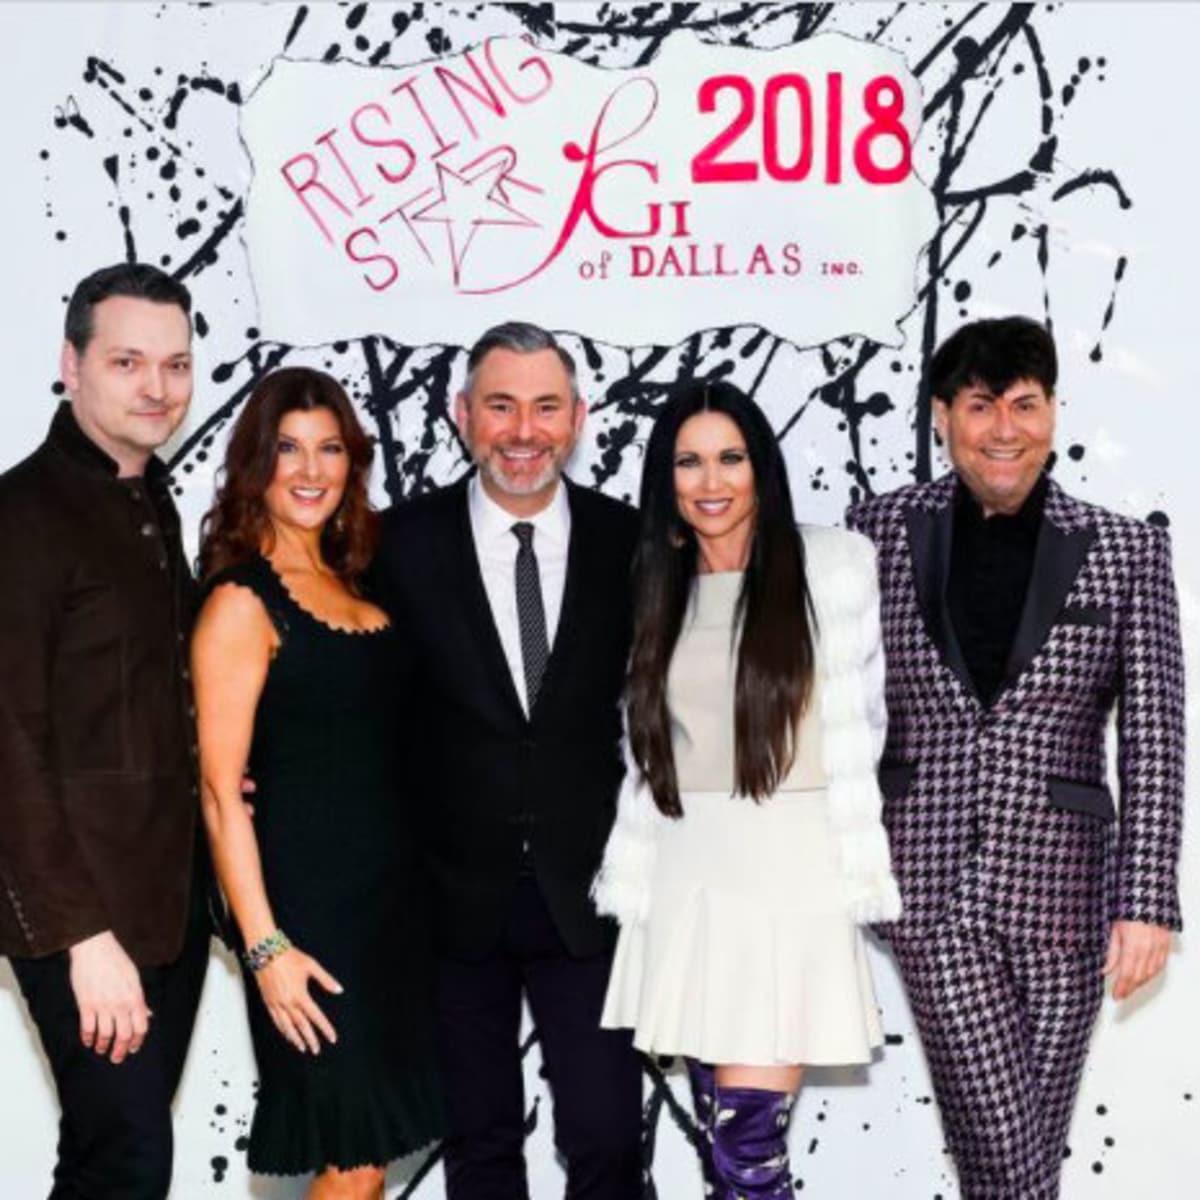 Cynthia Smoot, Chad Collum, Cynthia Smoot, Ken Weber, LeeAnne Locken, Steve Kemble, Dallas_FGI Rising Star